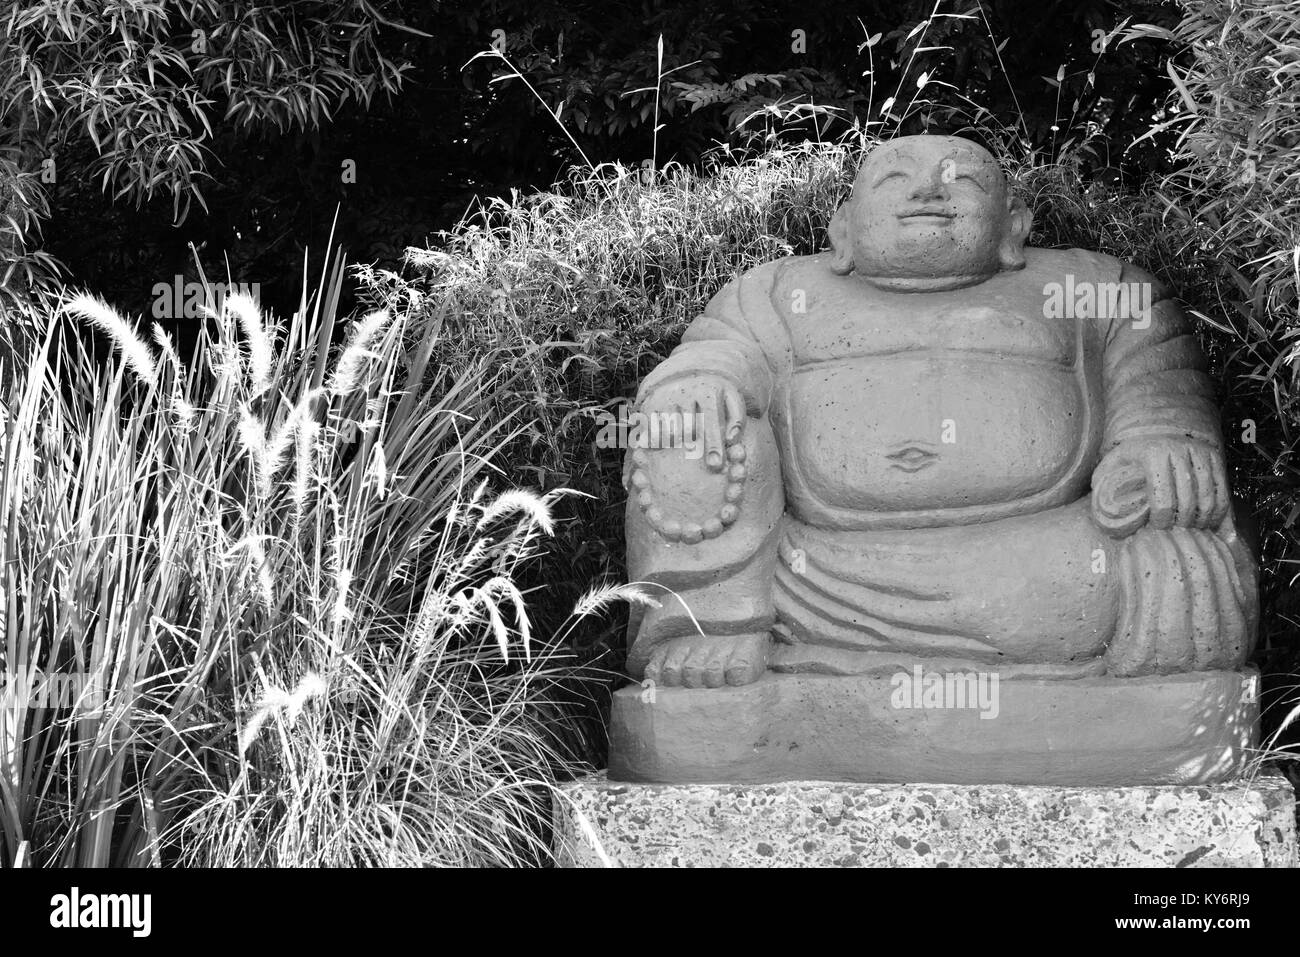 Large concrete buddha statue feature piece in a suburban garden, Sunshine coast, Queensland, Australia - Stock Image